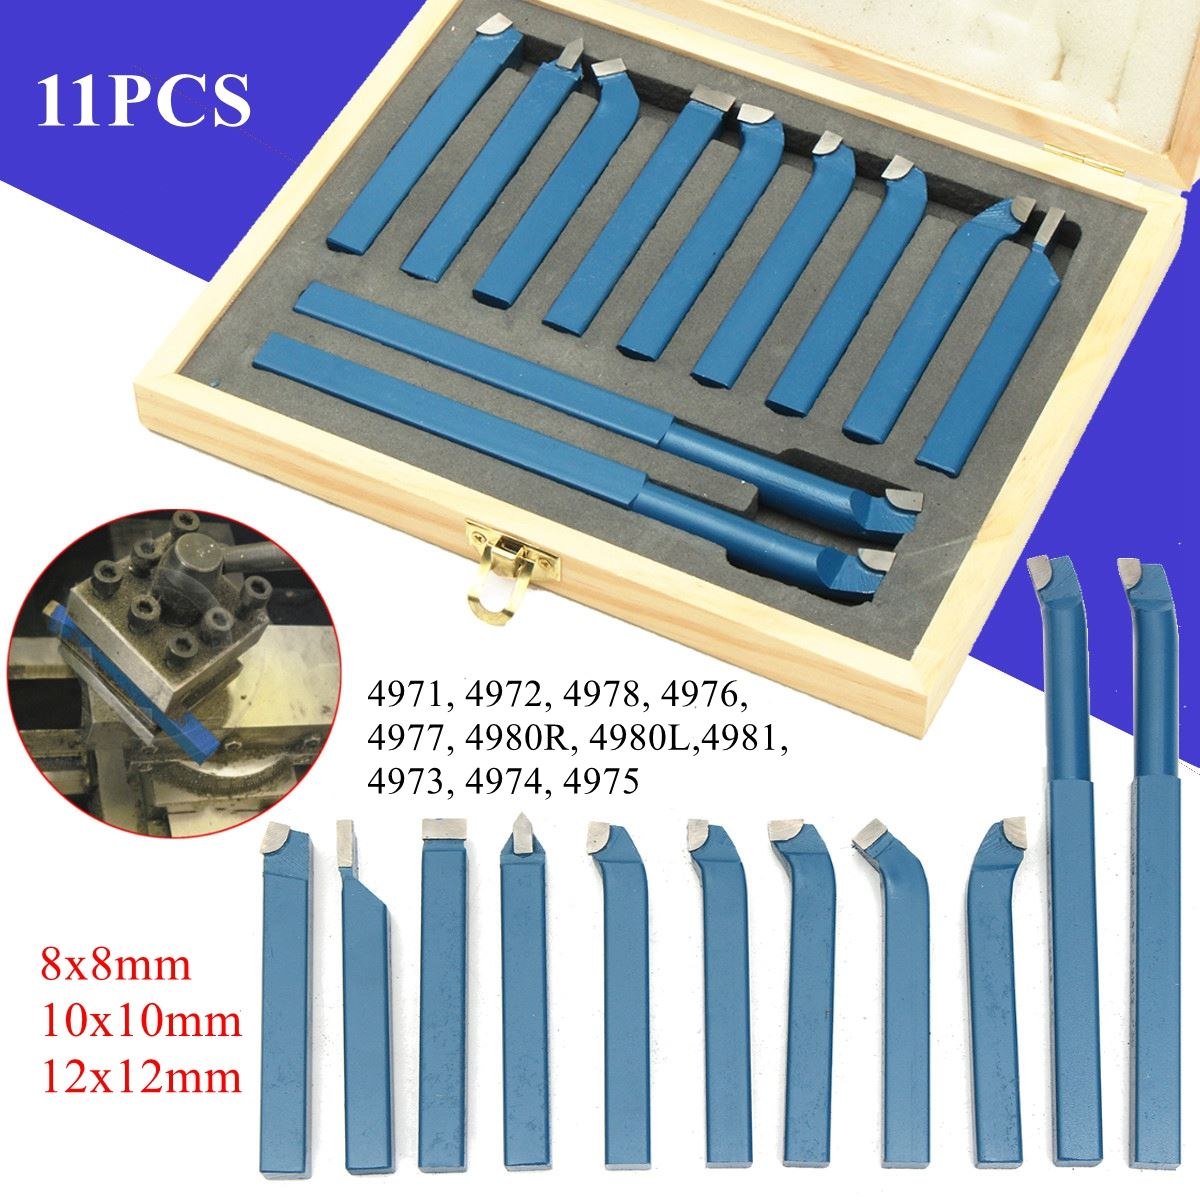 11Pcs Lathe Cutting Tool Set Carbide Tip External Turning Boring Bit 8/10/12mm